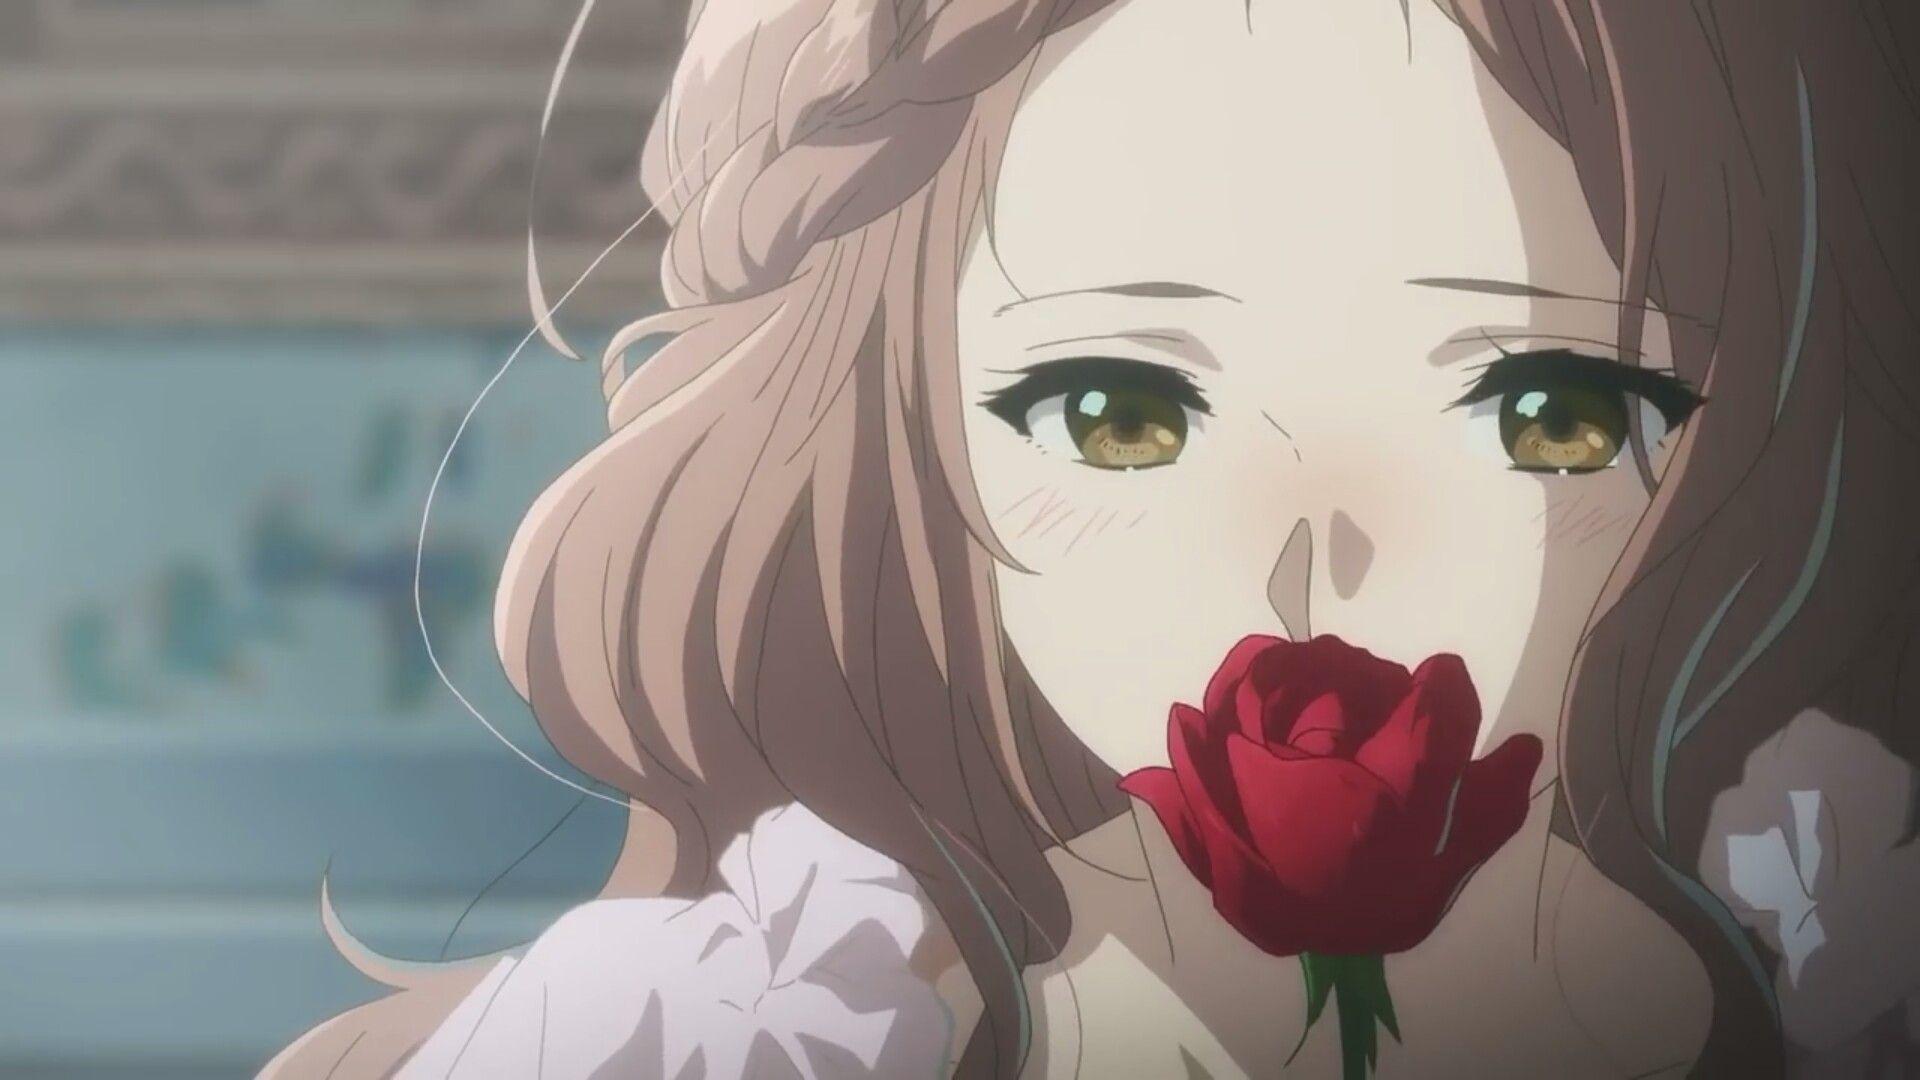 Épinglé par 金糸雀 sur female | Paysage manga, Dessin animé manga, Dessin manga